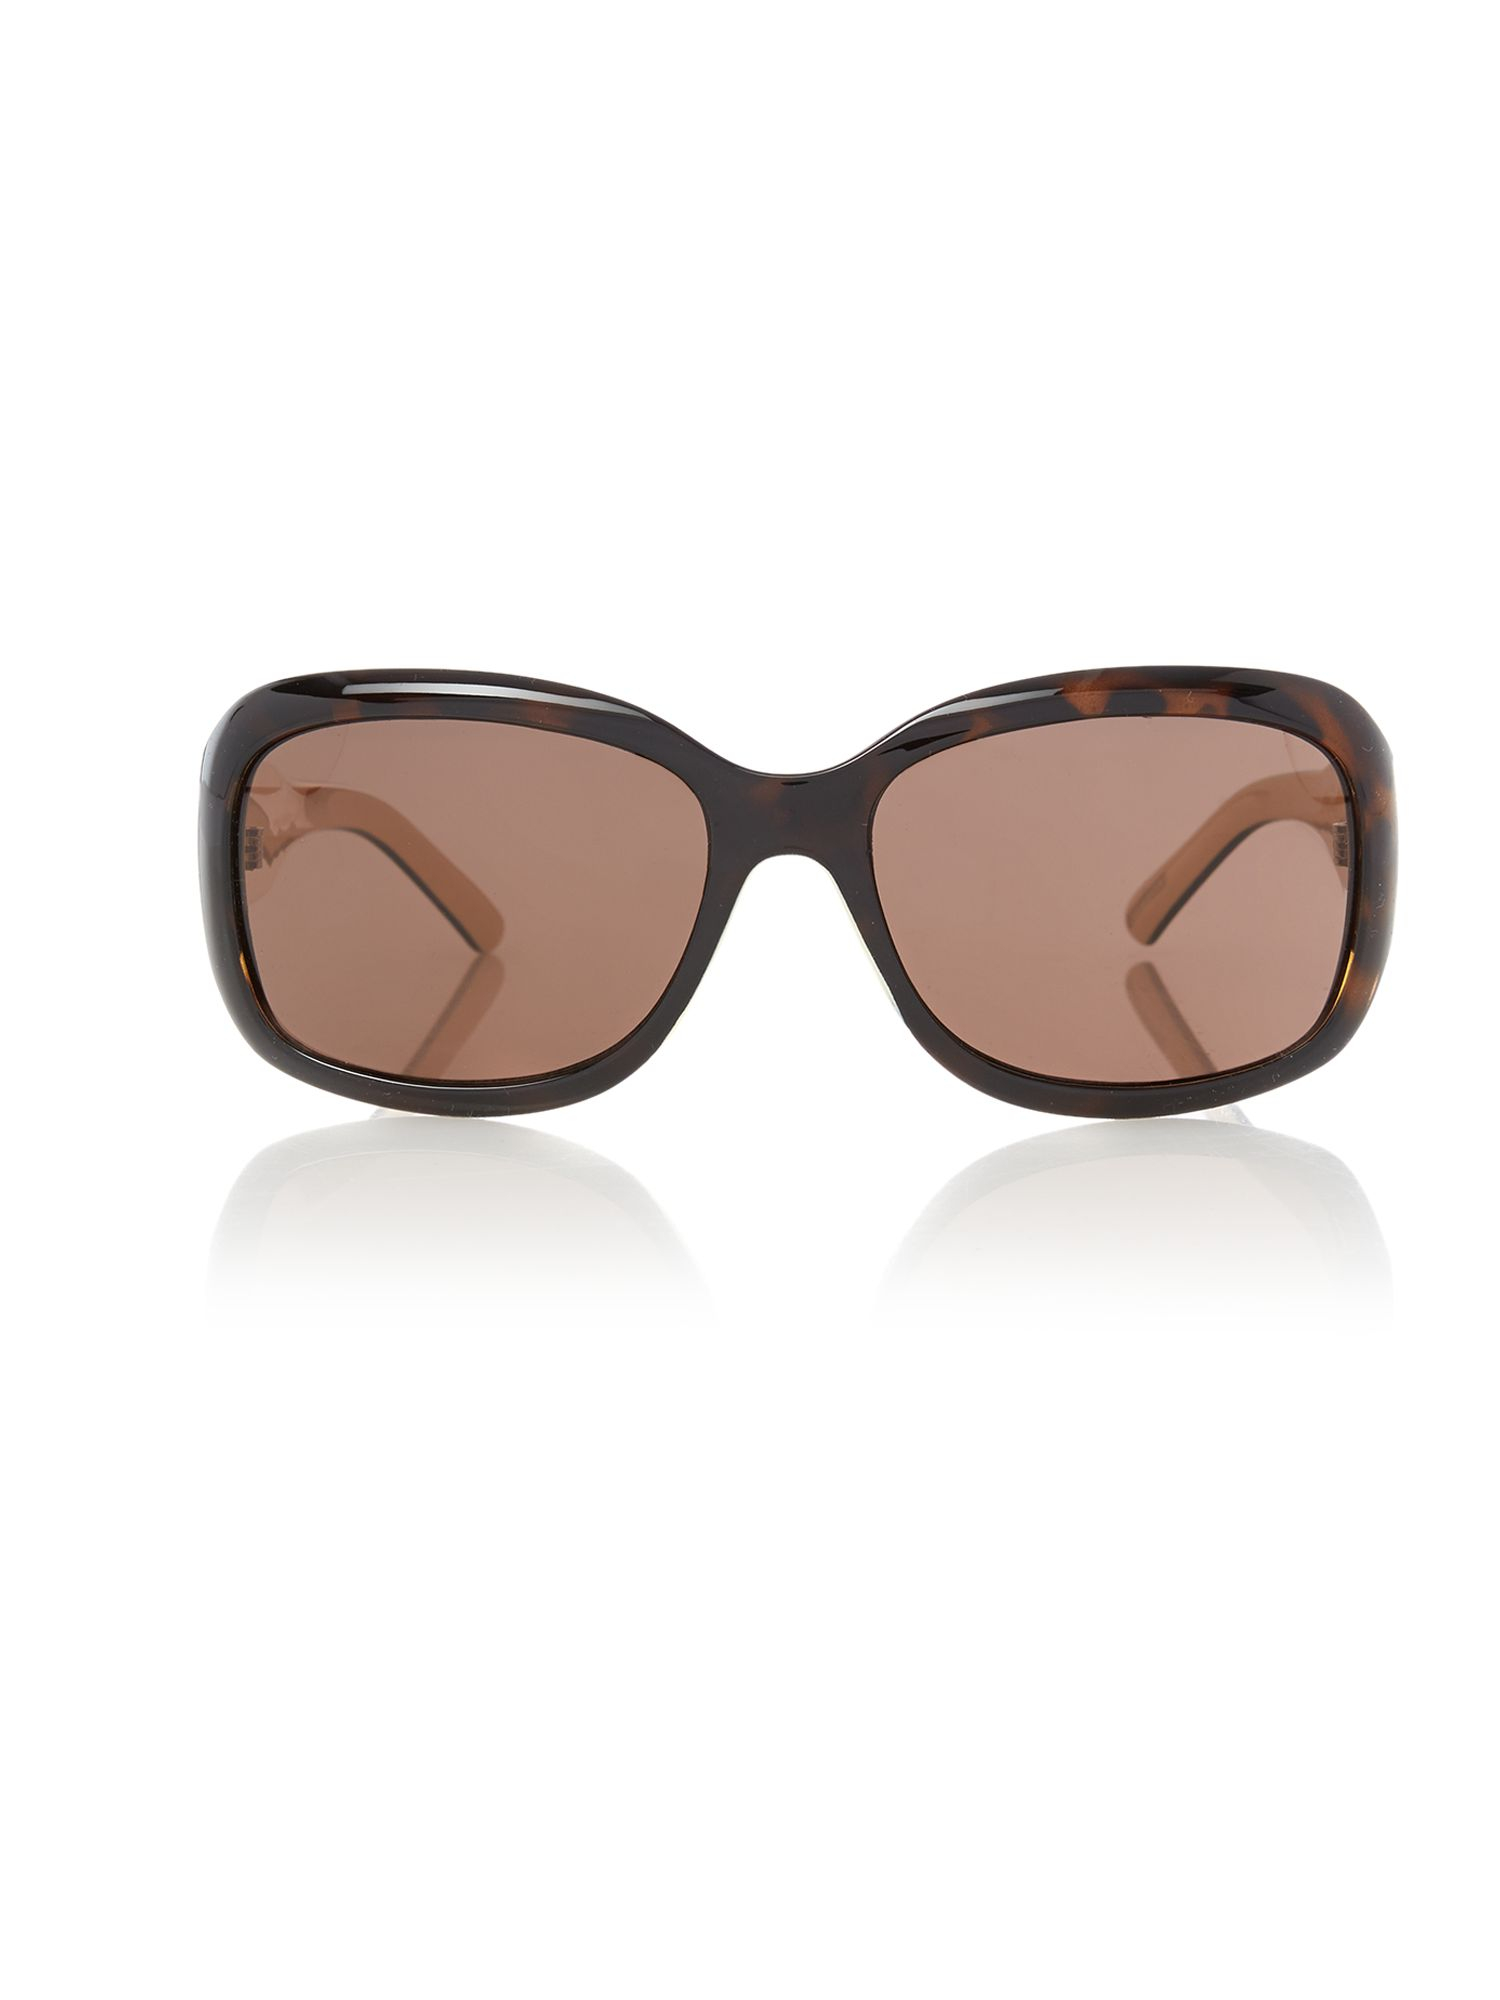 Ted Baker Tb1183 Ladies Square Sunglasses